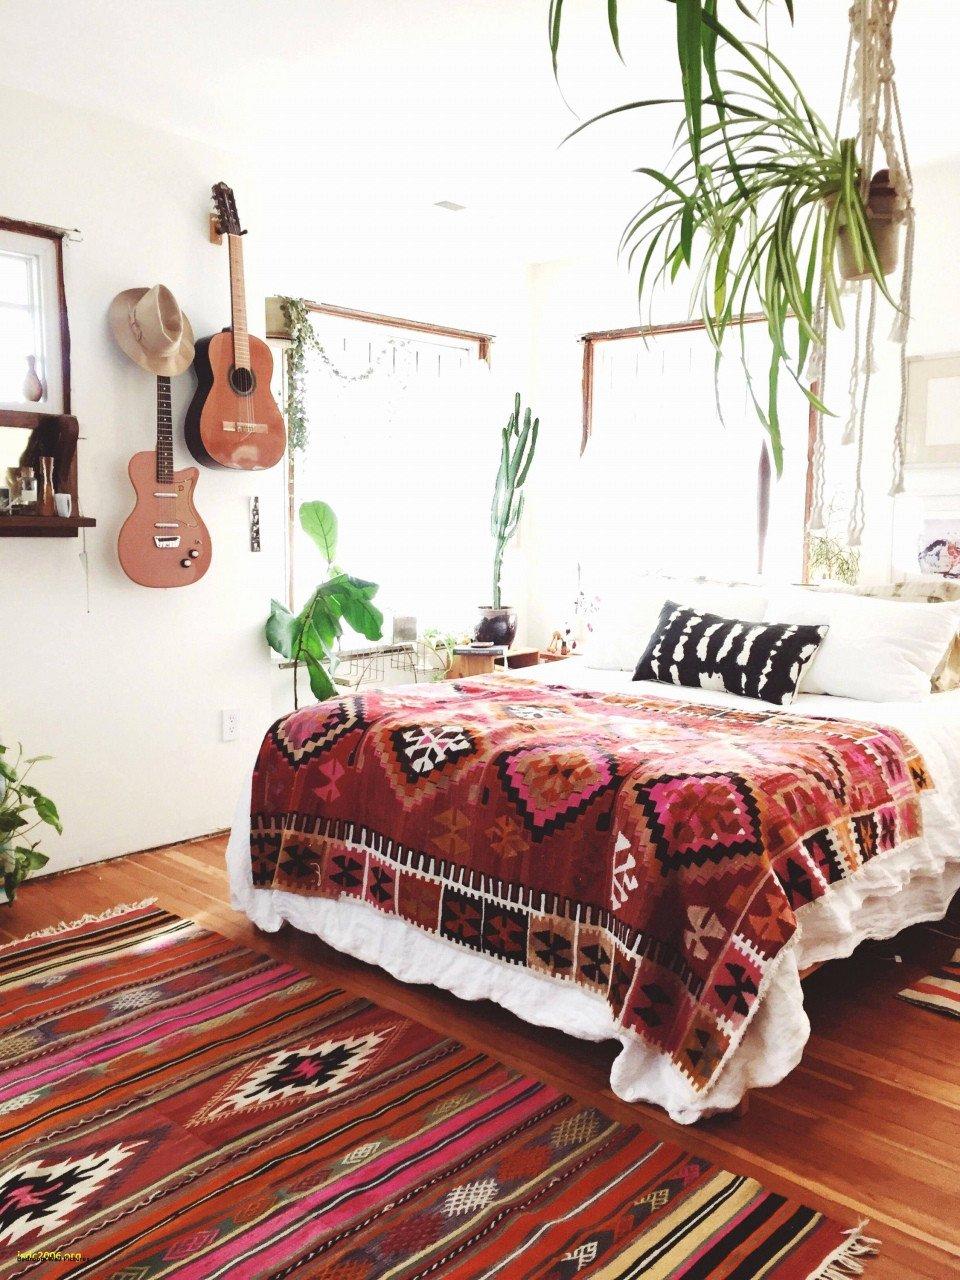 Red and Brown Bedroom Unique Bedroom Art Wall Decals for Bedroom Unique 1 Kirkland Wall